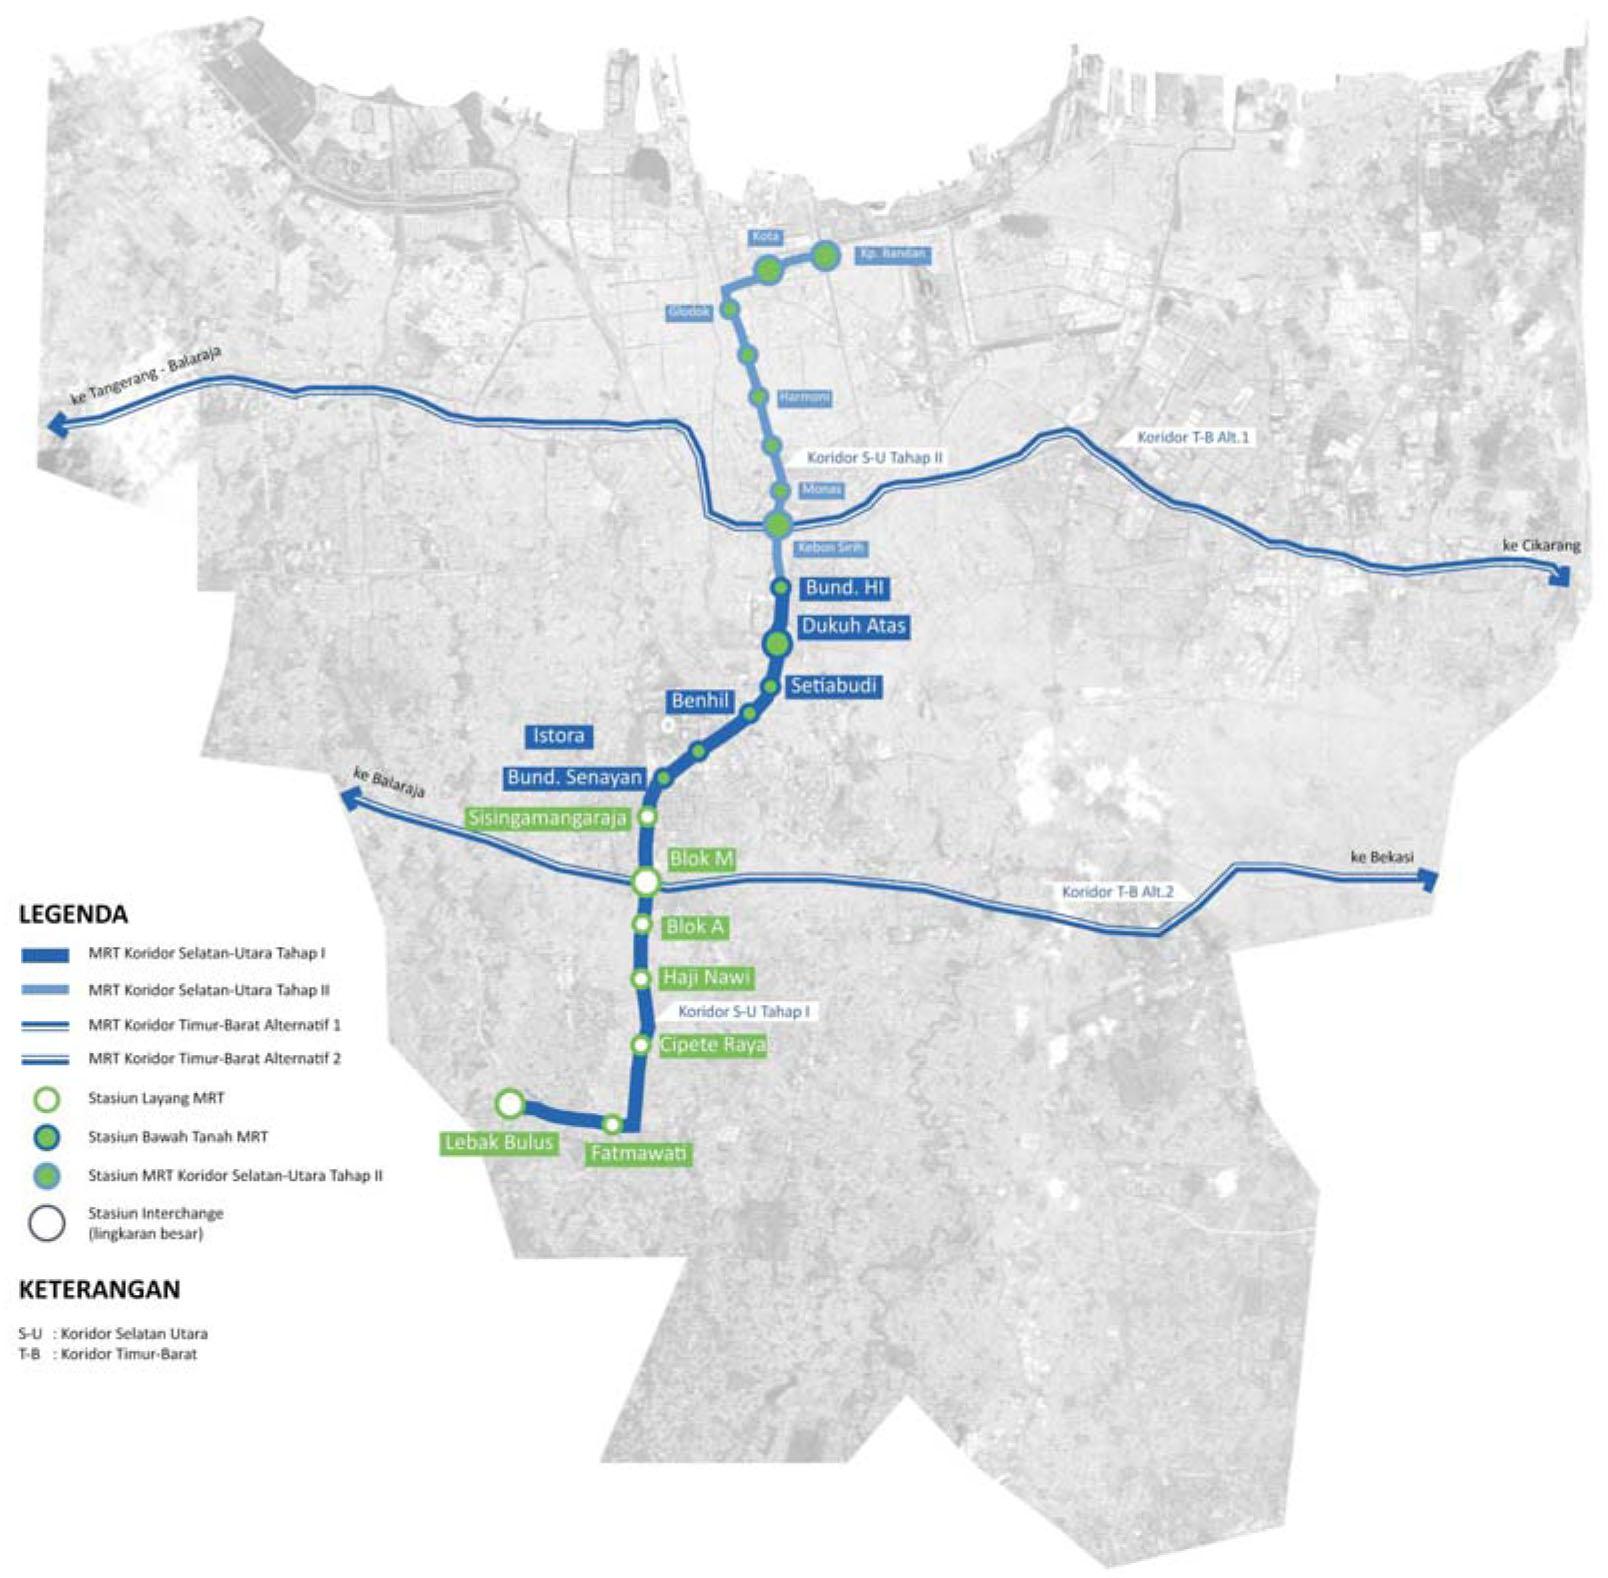 Peta MRT Jakarta Lebak Bulus - Bundaran HI